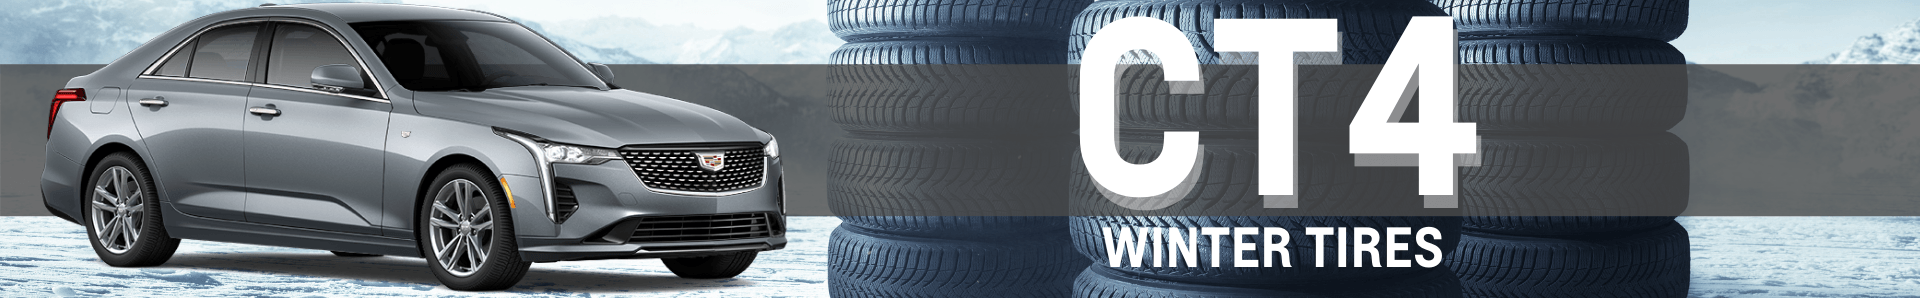 CT4 Winter tire deals